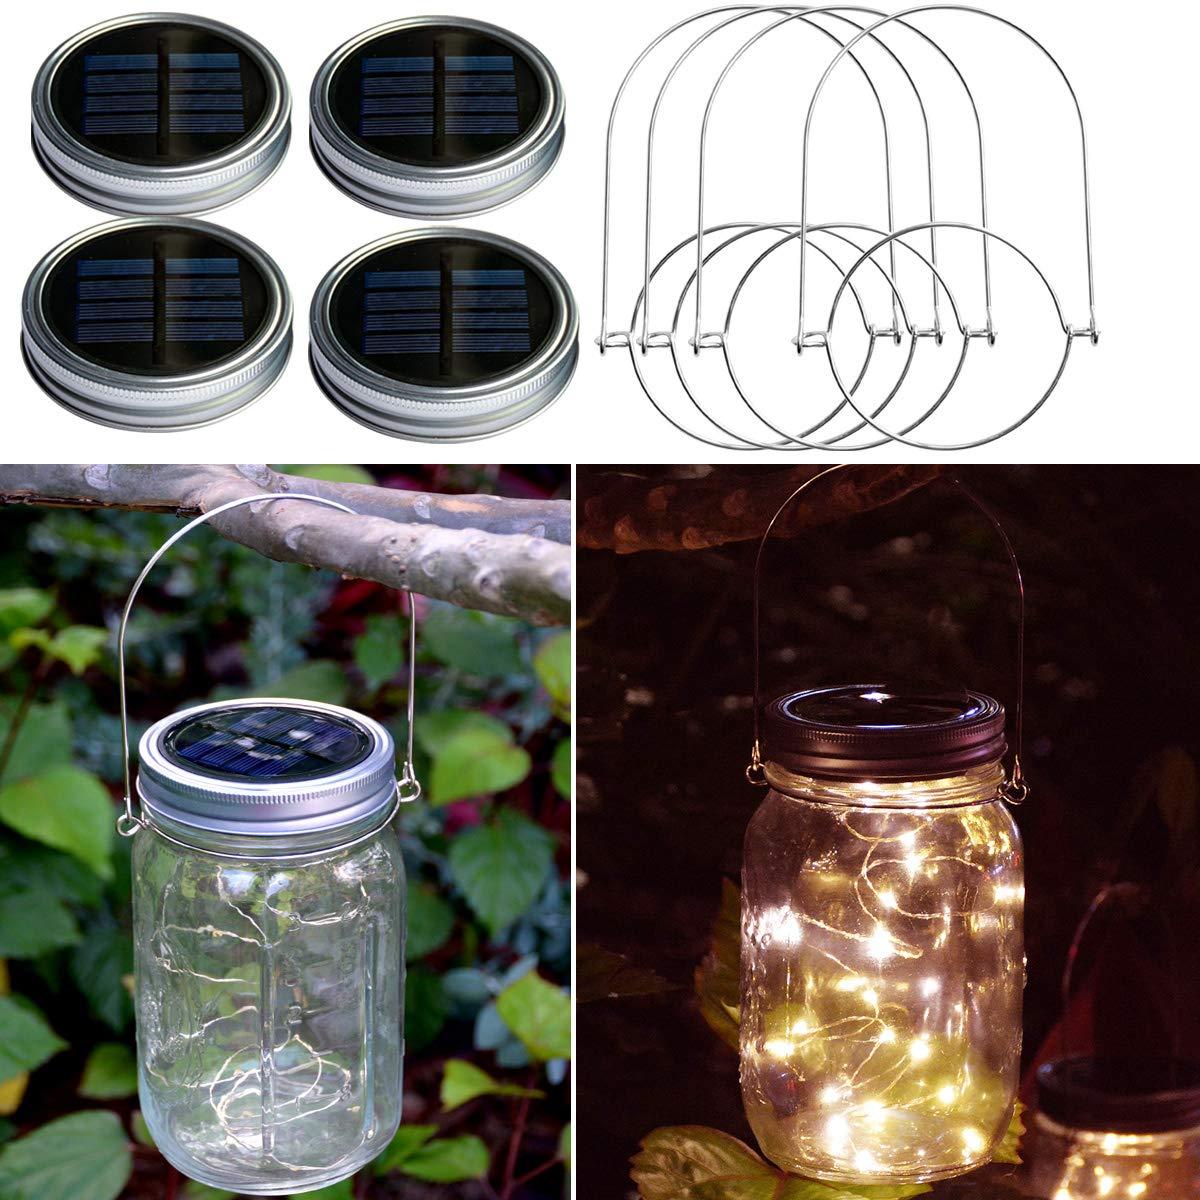 Patio Decor Pathway LAMPDREAM 4 Packs Regular Mouth Solar Mason Jar Lids Lights with Hangers Yard Warm White Waterproof Mason Jar Solar Lights for Garden